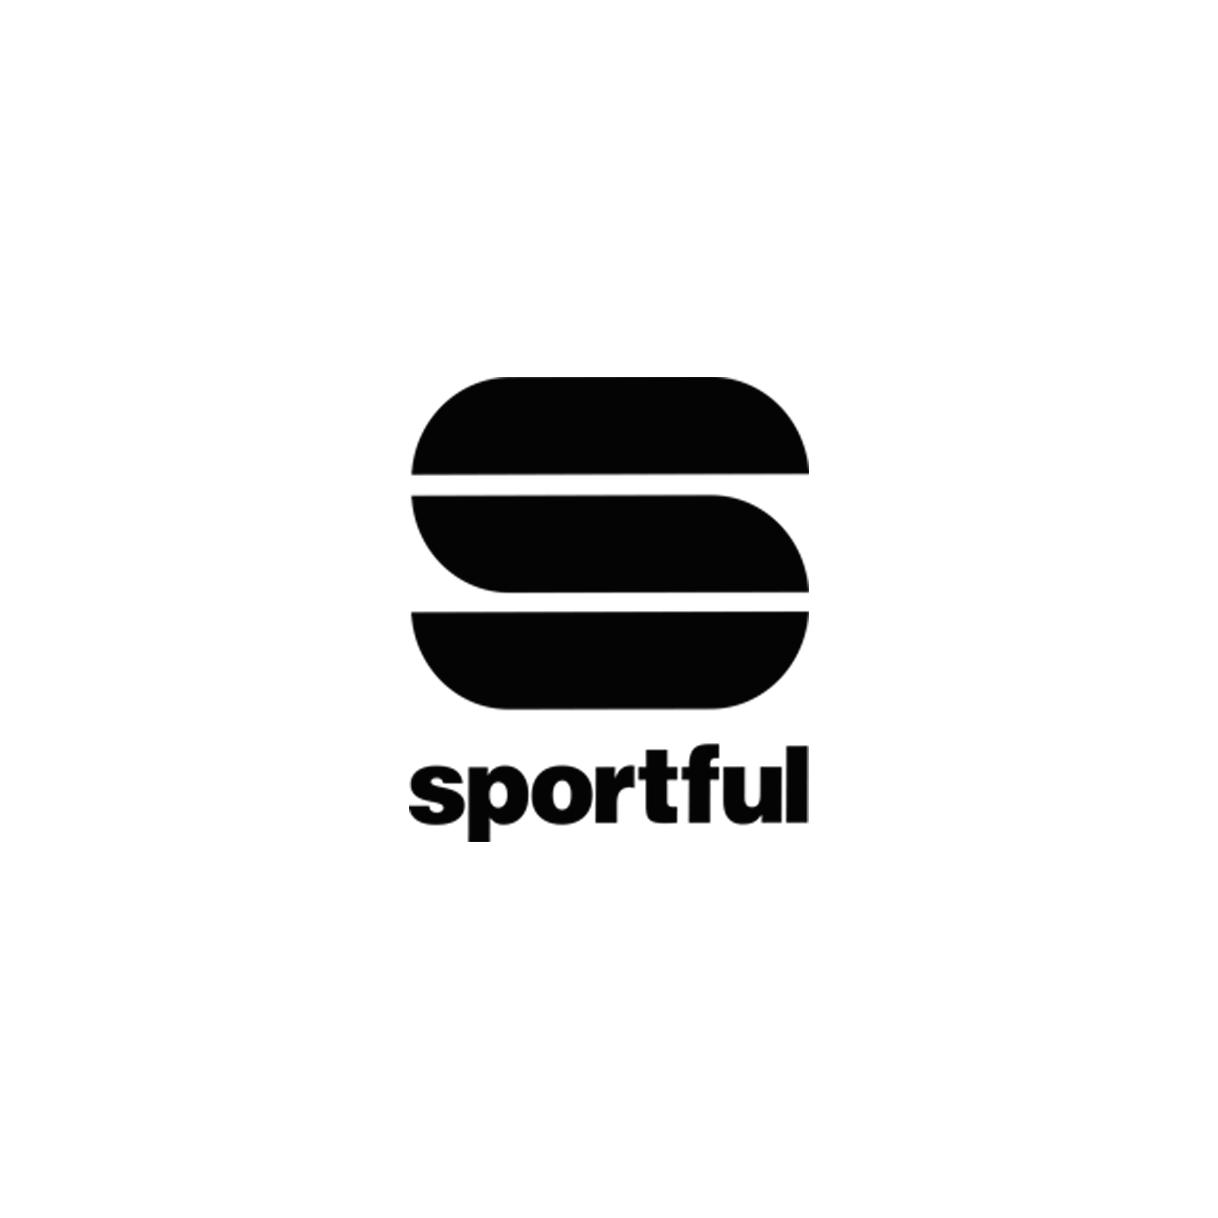 Sportful - Sportswear Company for Cycling and Nordic Ski